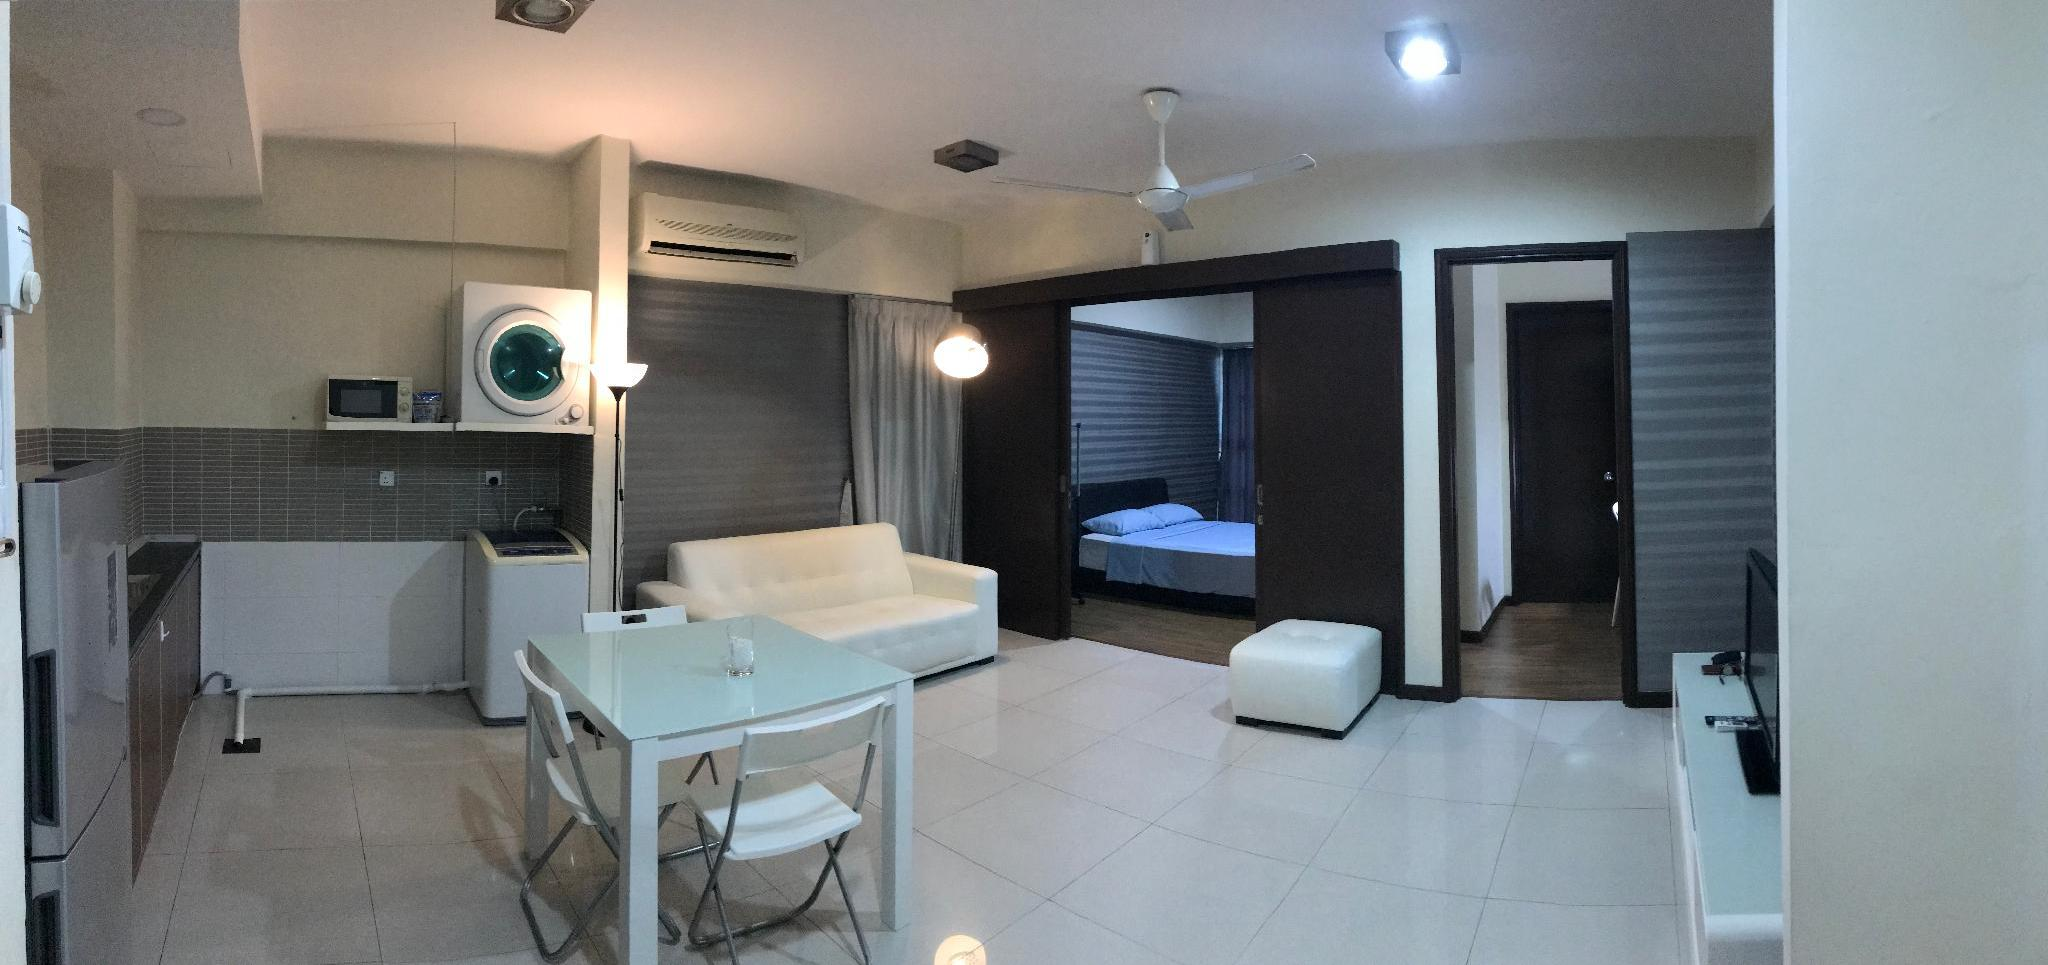 Saujana Residency Subang Jaya SS16